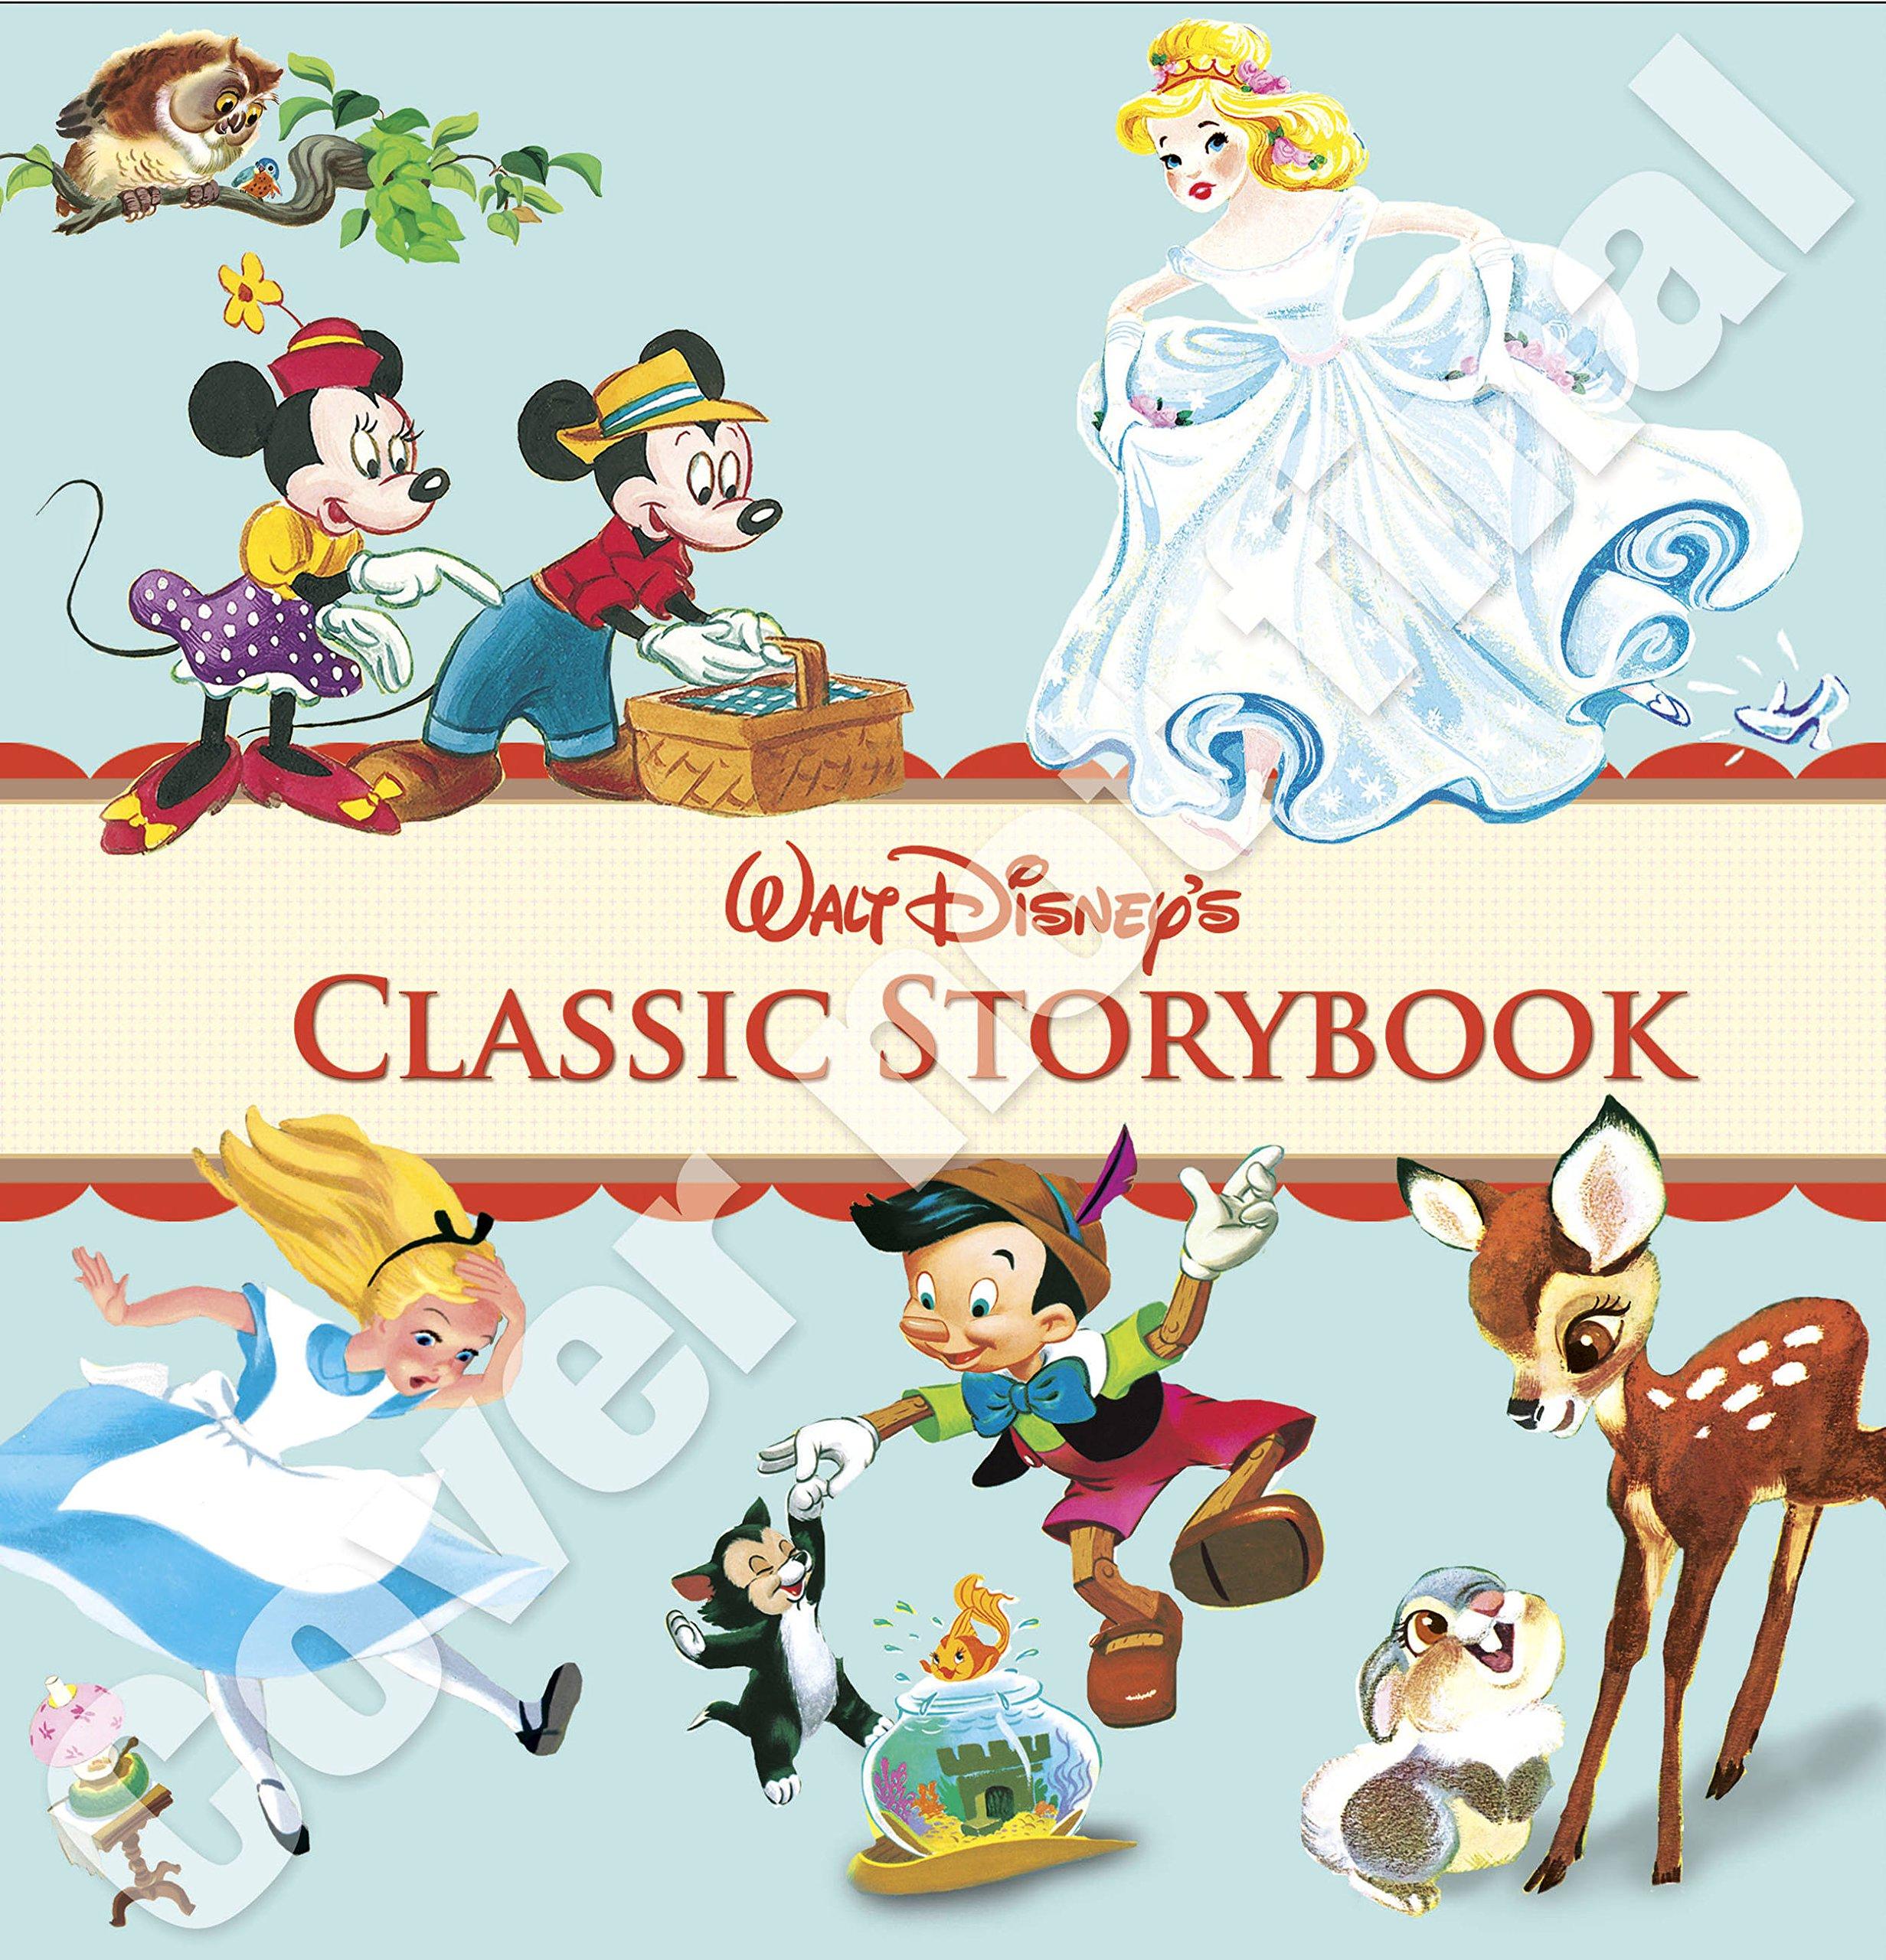 Walt Disney's Classic Storybook (Volume 3) (Storybook Collection) PDF